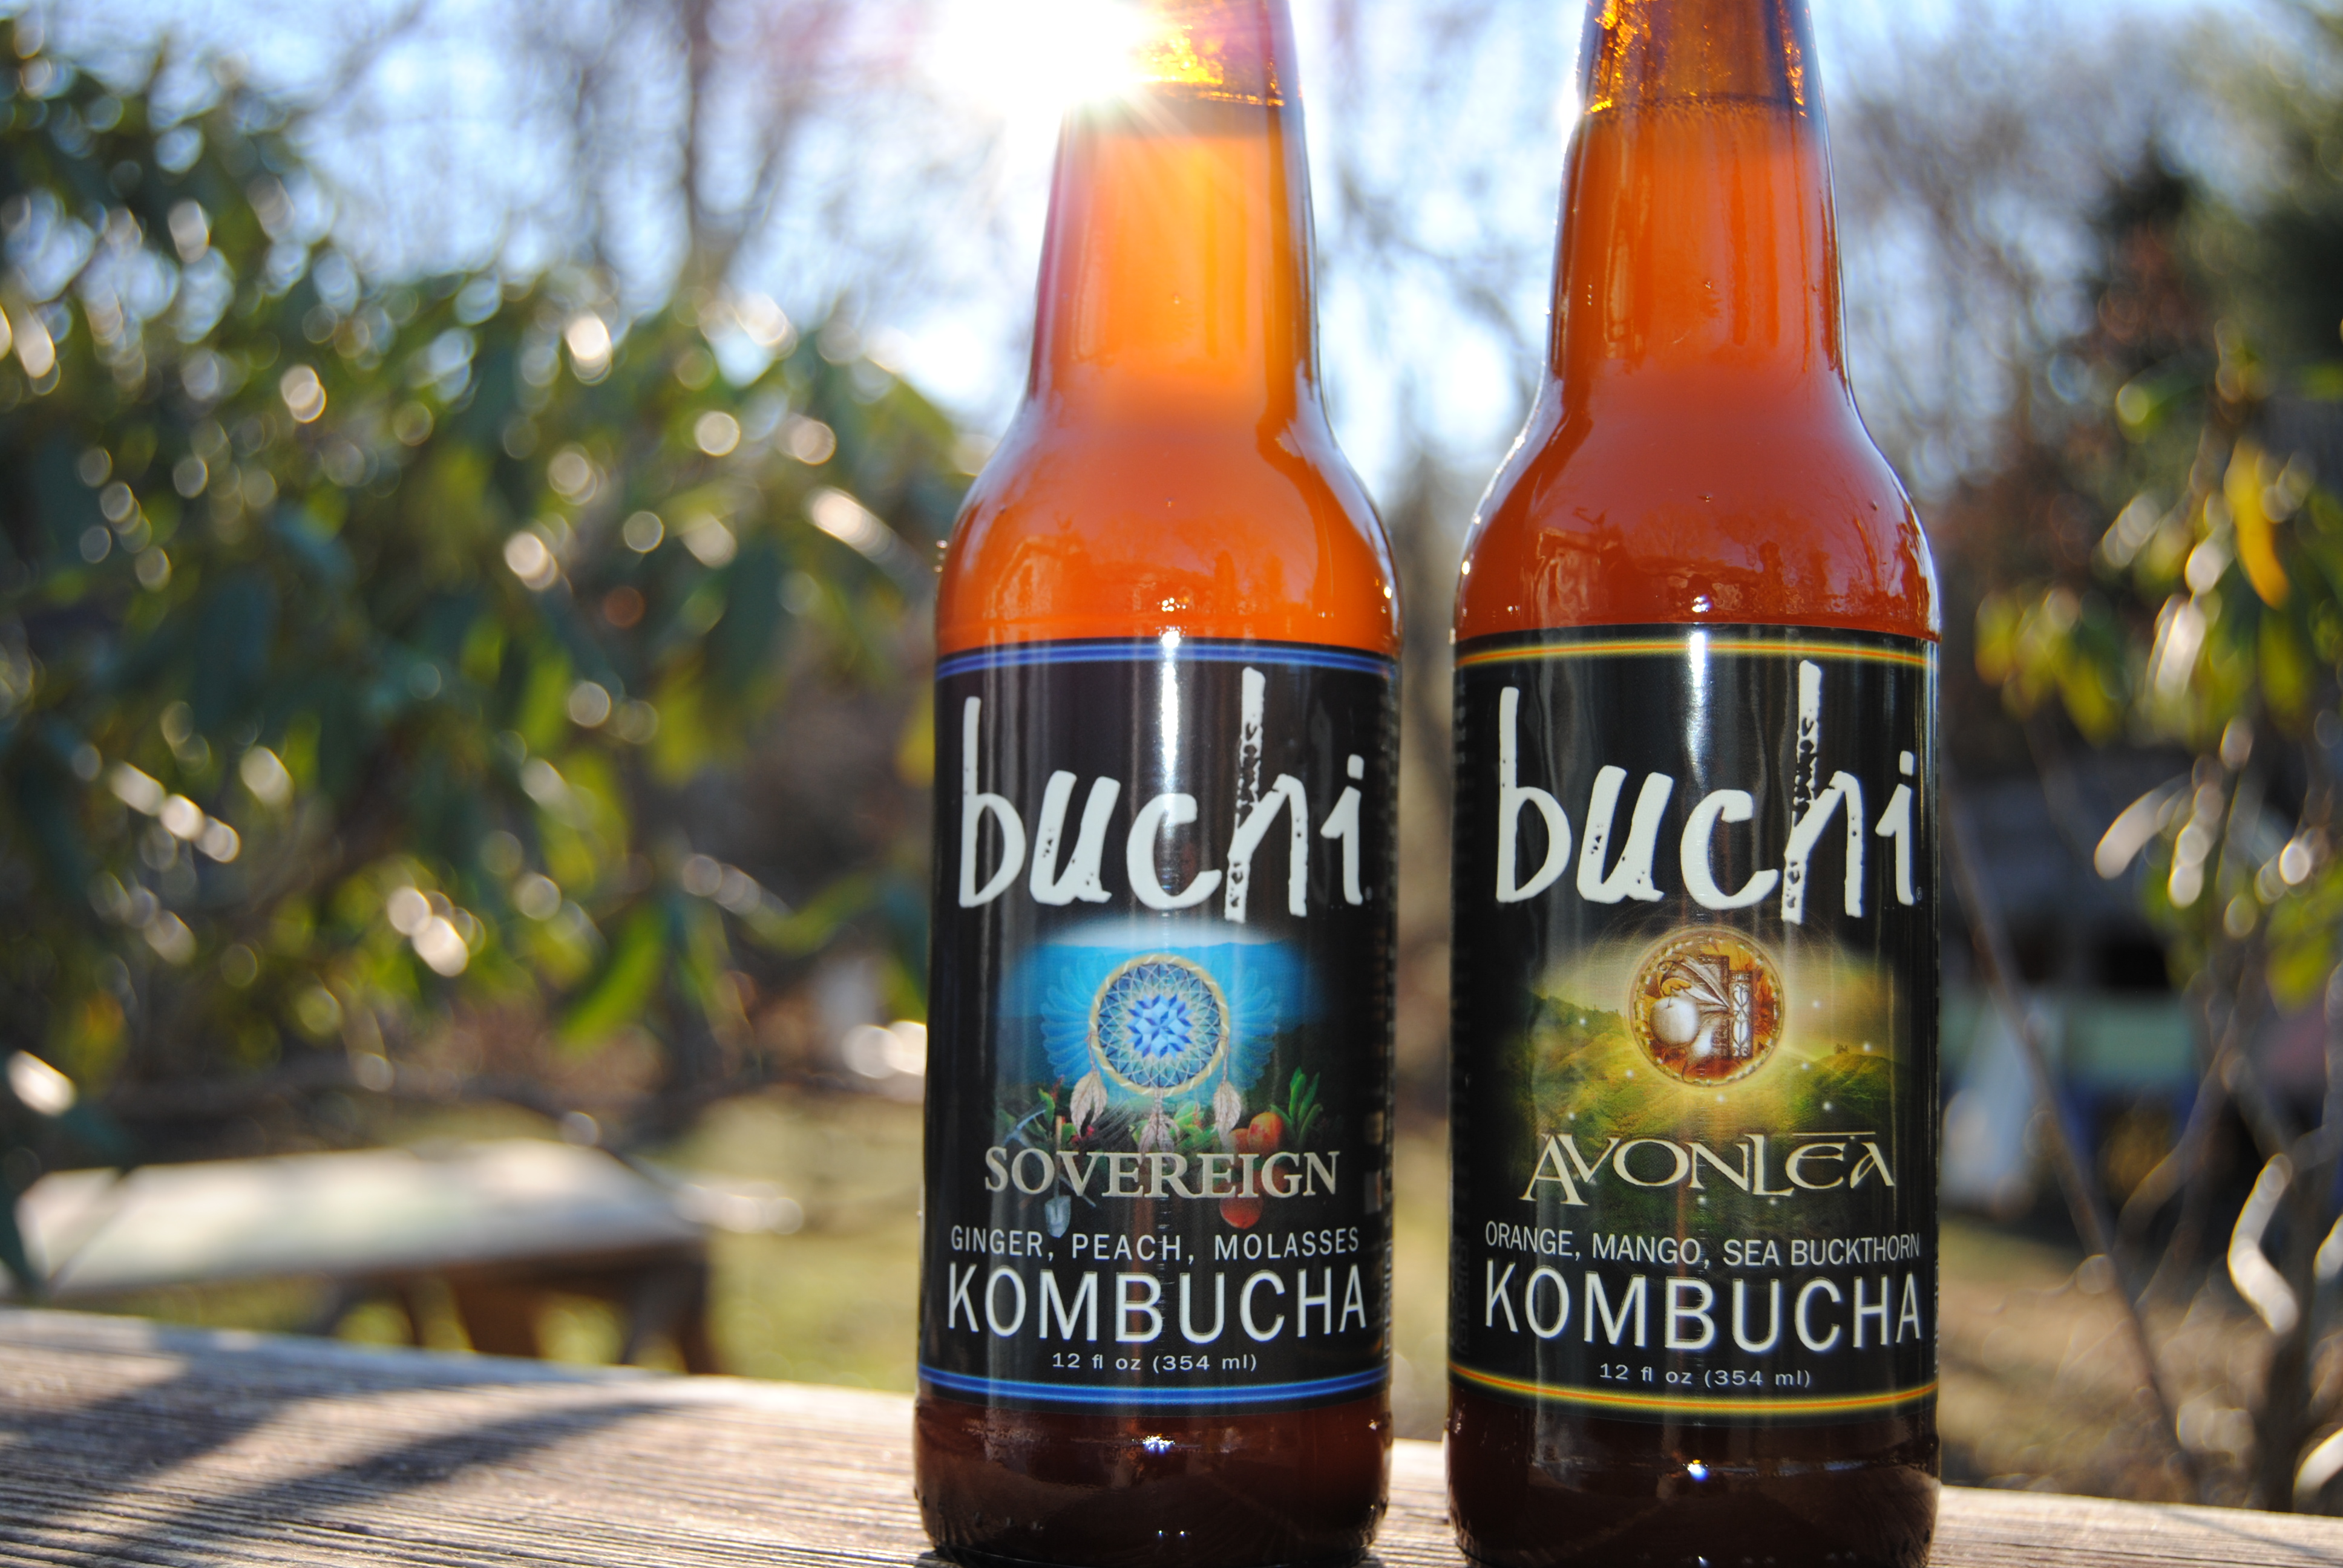 Buchi-picnic-shot